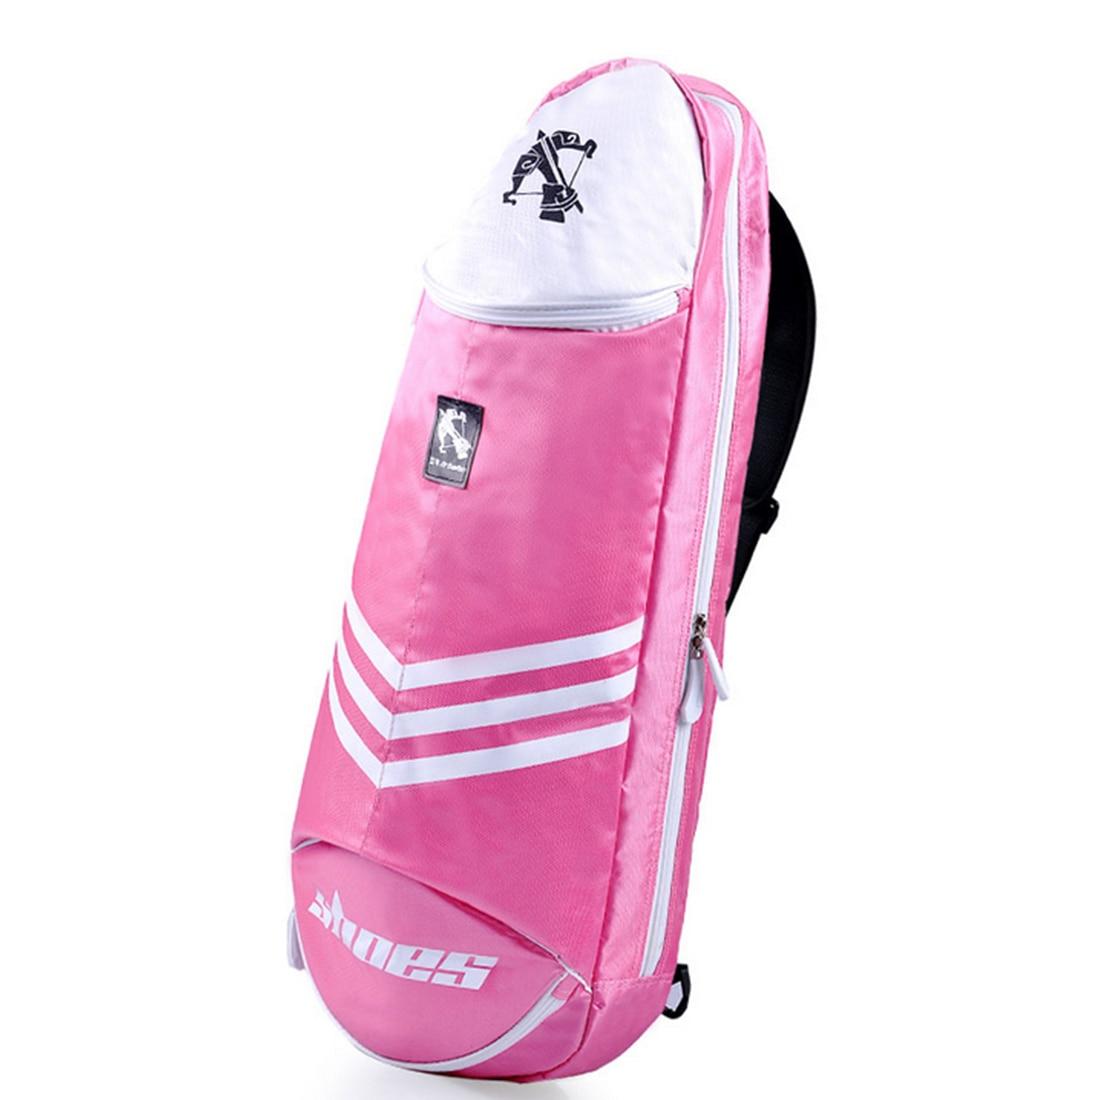 Big Racquet Sports Bag Badminton Bag Crossbow Waterproof Multi-layer Placement Tennis Racket Dacron Shoulder Bag